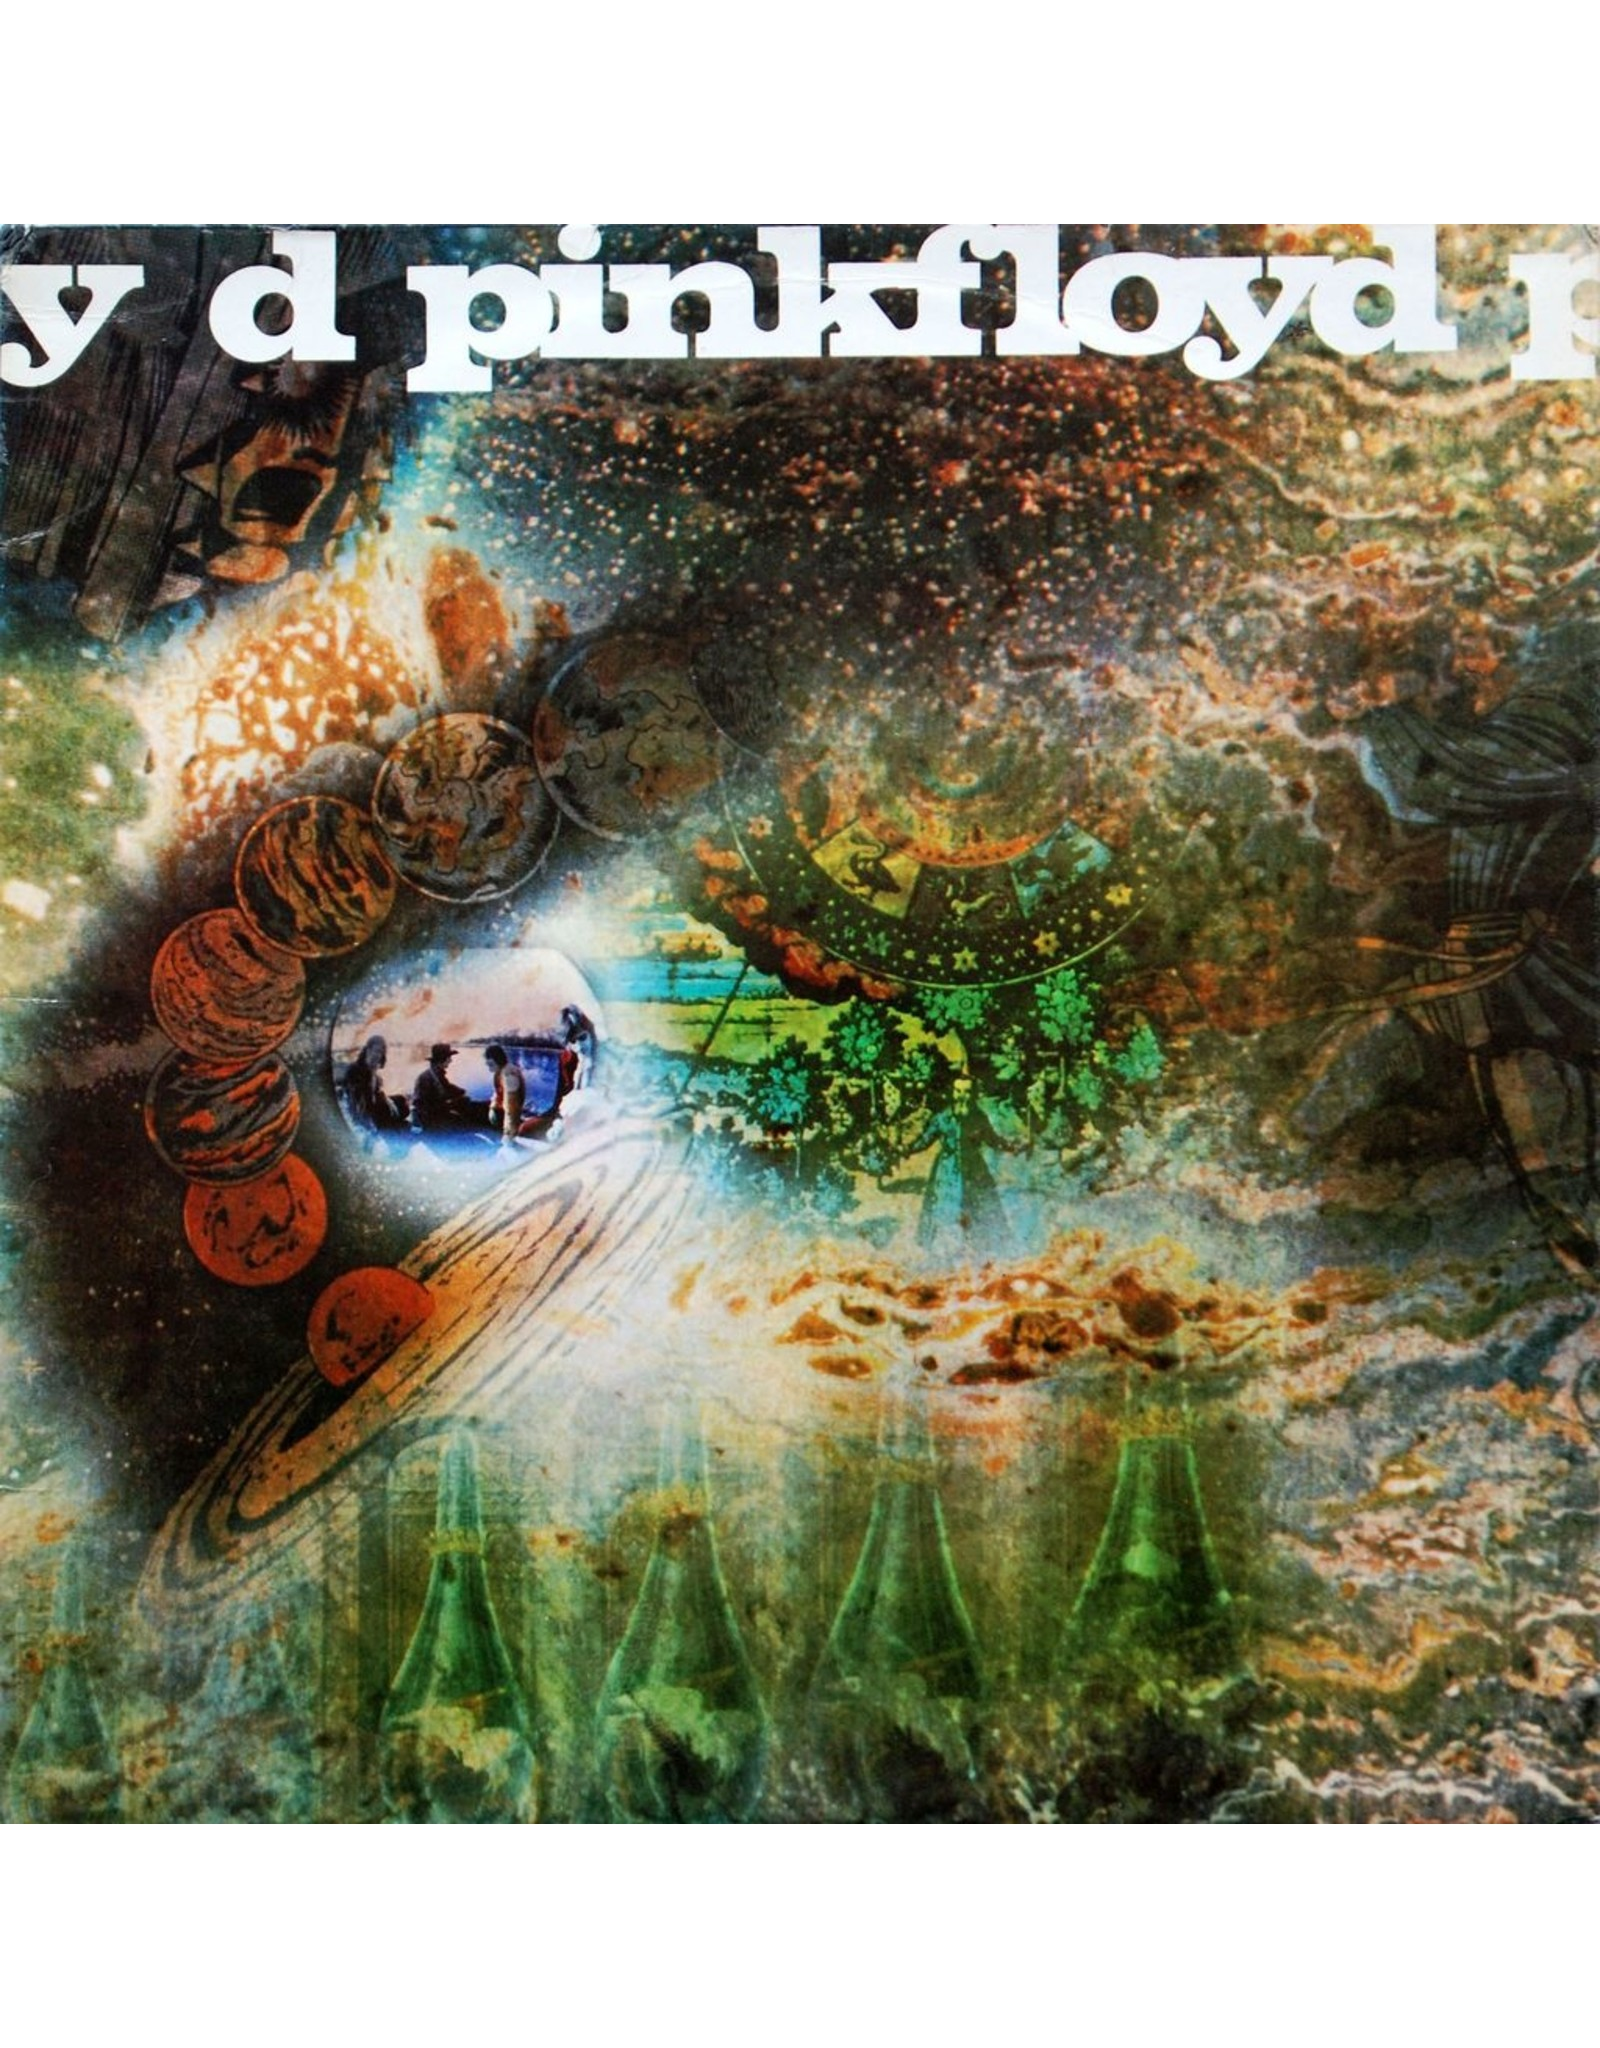 New Vinyl Pink Floyd - A Saucerful Of Secrets LP